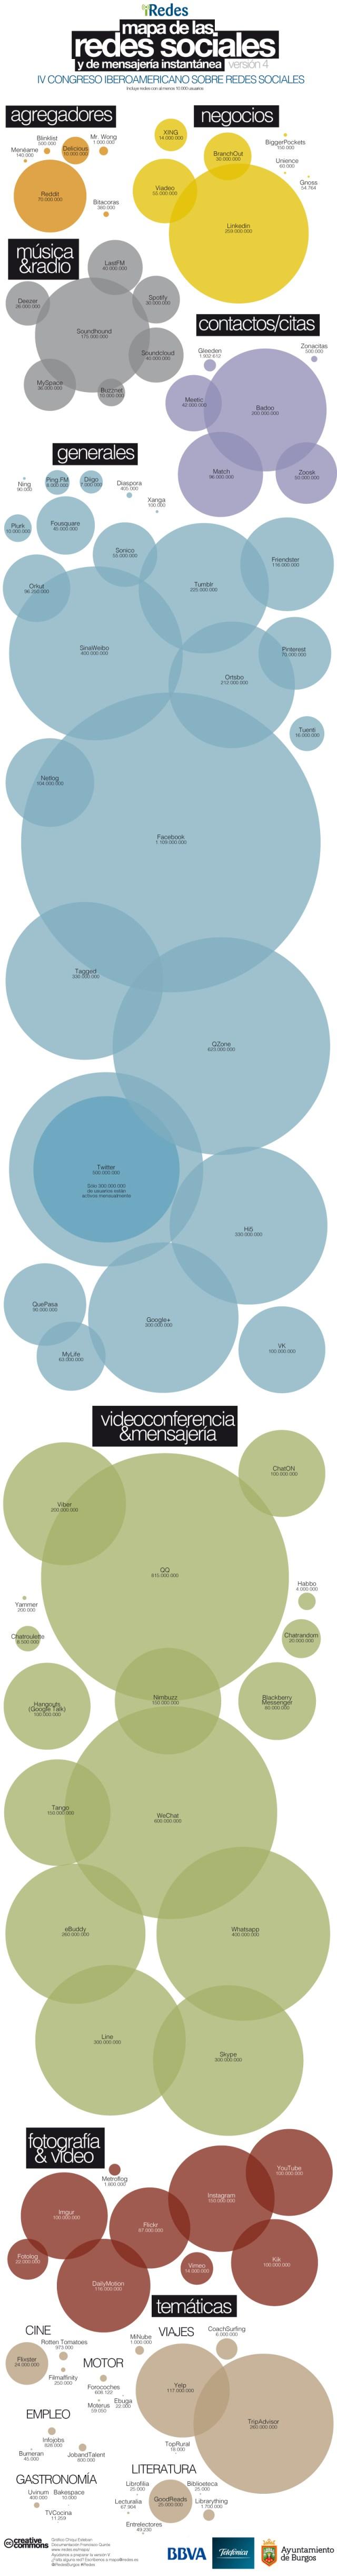 mapa vertical - redes sociales